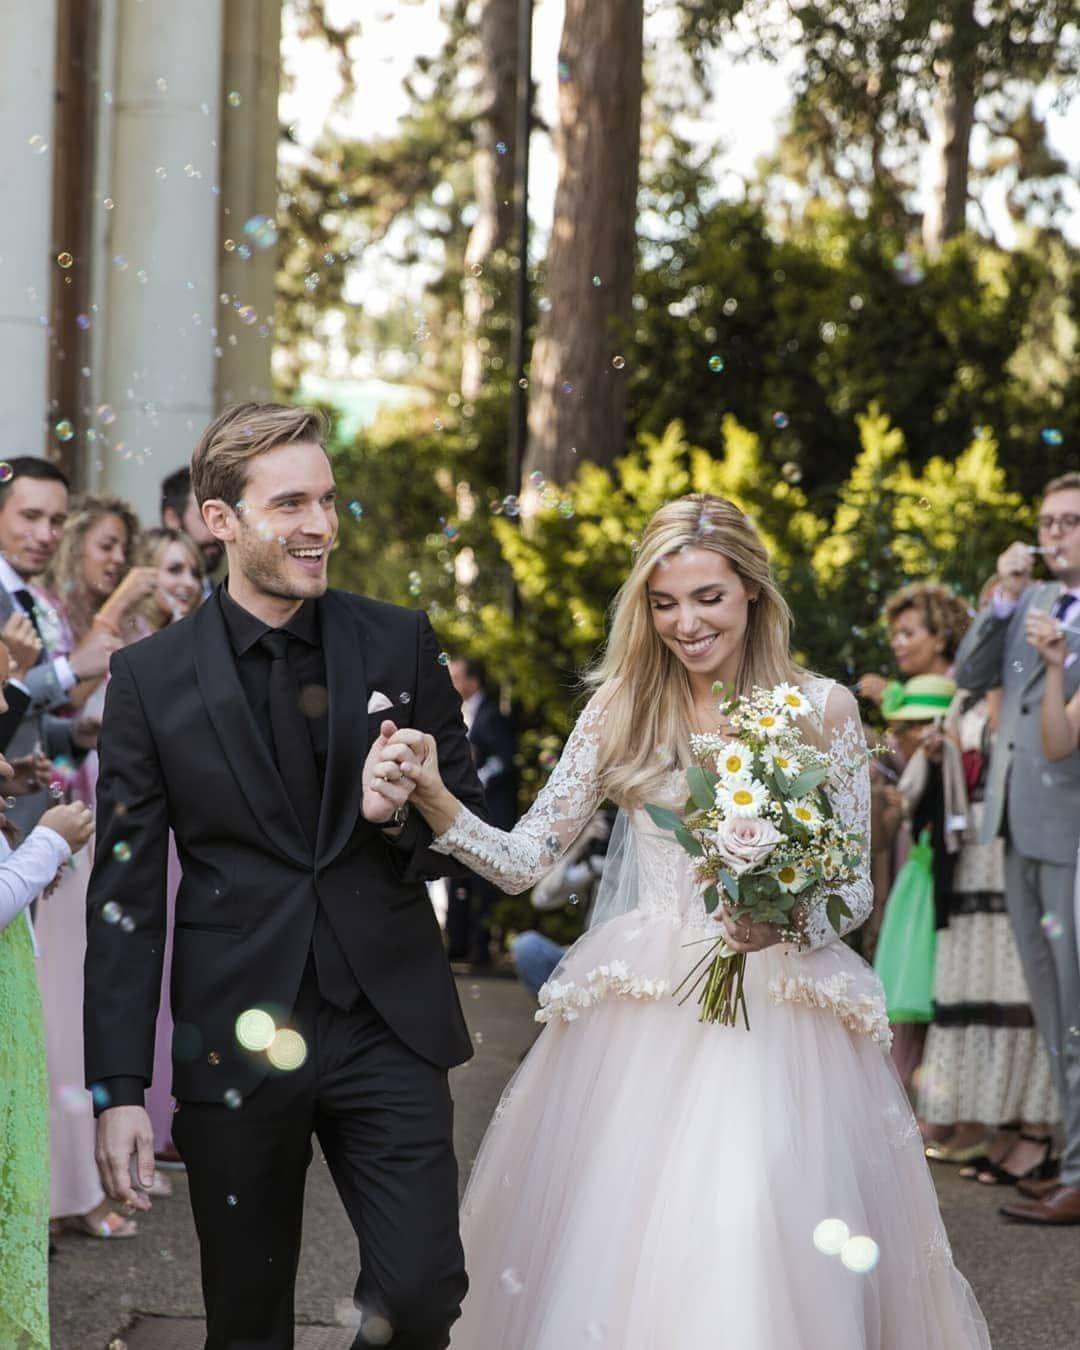 Popular YouTuber PewDiePie marries the love of his life